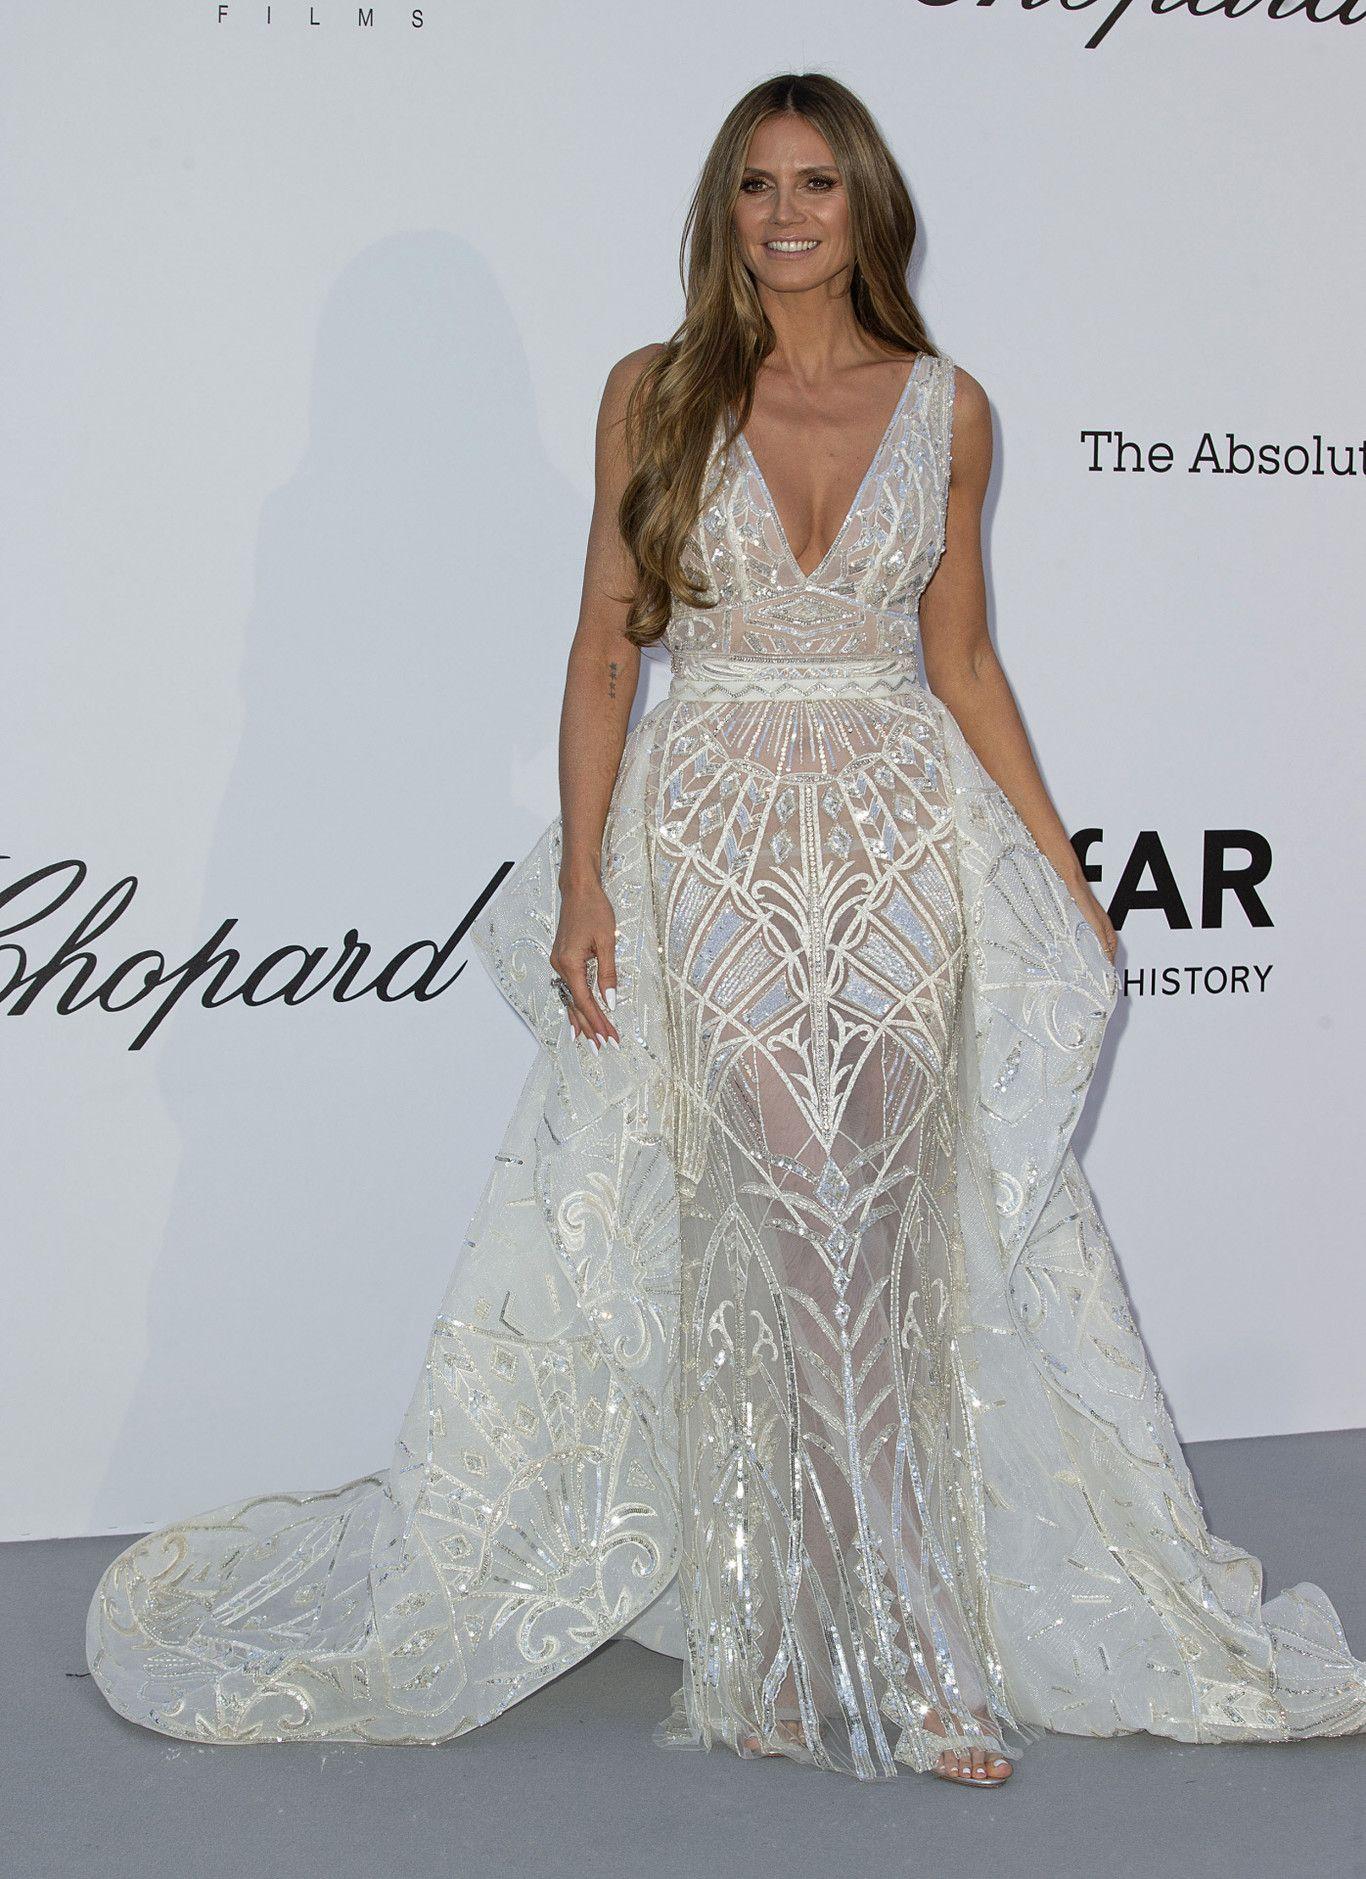 , El vestido de novia de Pilar Rubio ya lo llevó Heidi Klum en 2018, Anja Rubik Blog, Anja Rubik Blog